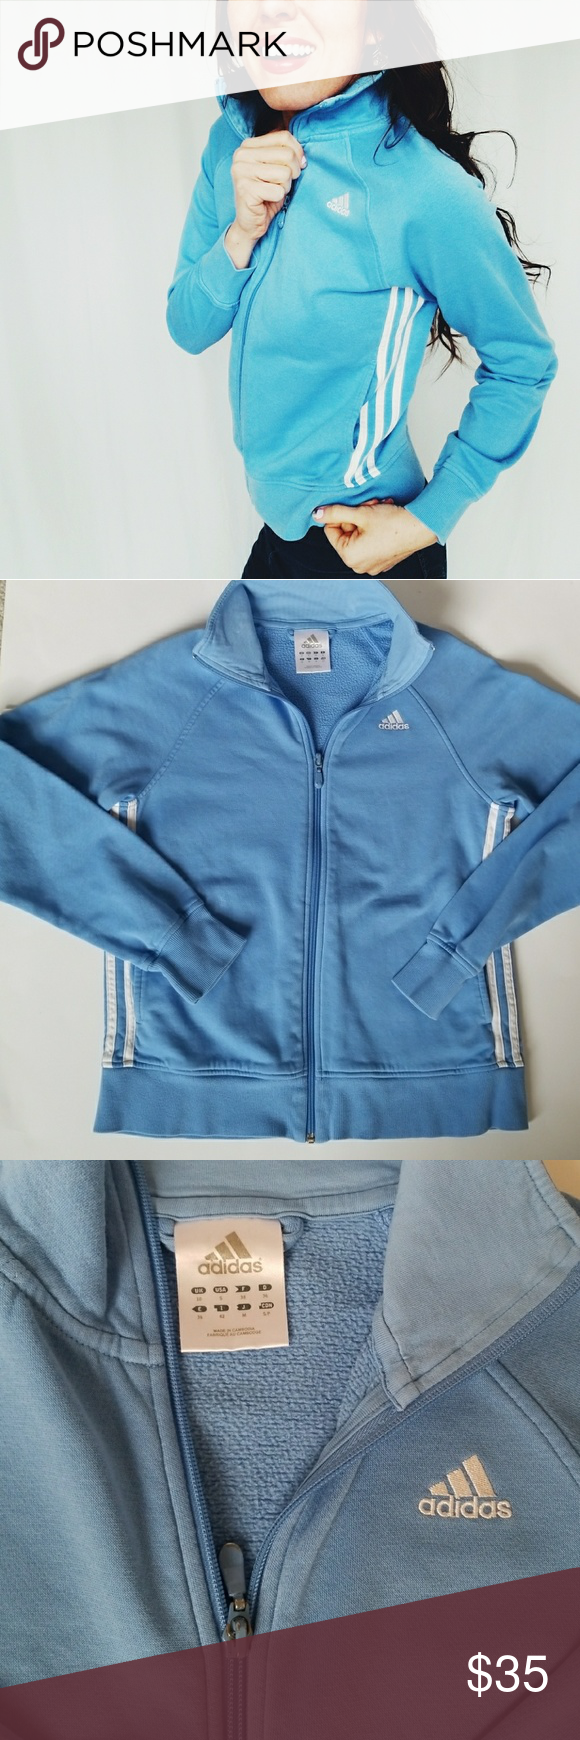 Sudadera | con cremallera cremallera azul Adidas E2 Adidas | 06f2452 - accademiadellescienzedellumbria.xyz